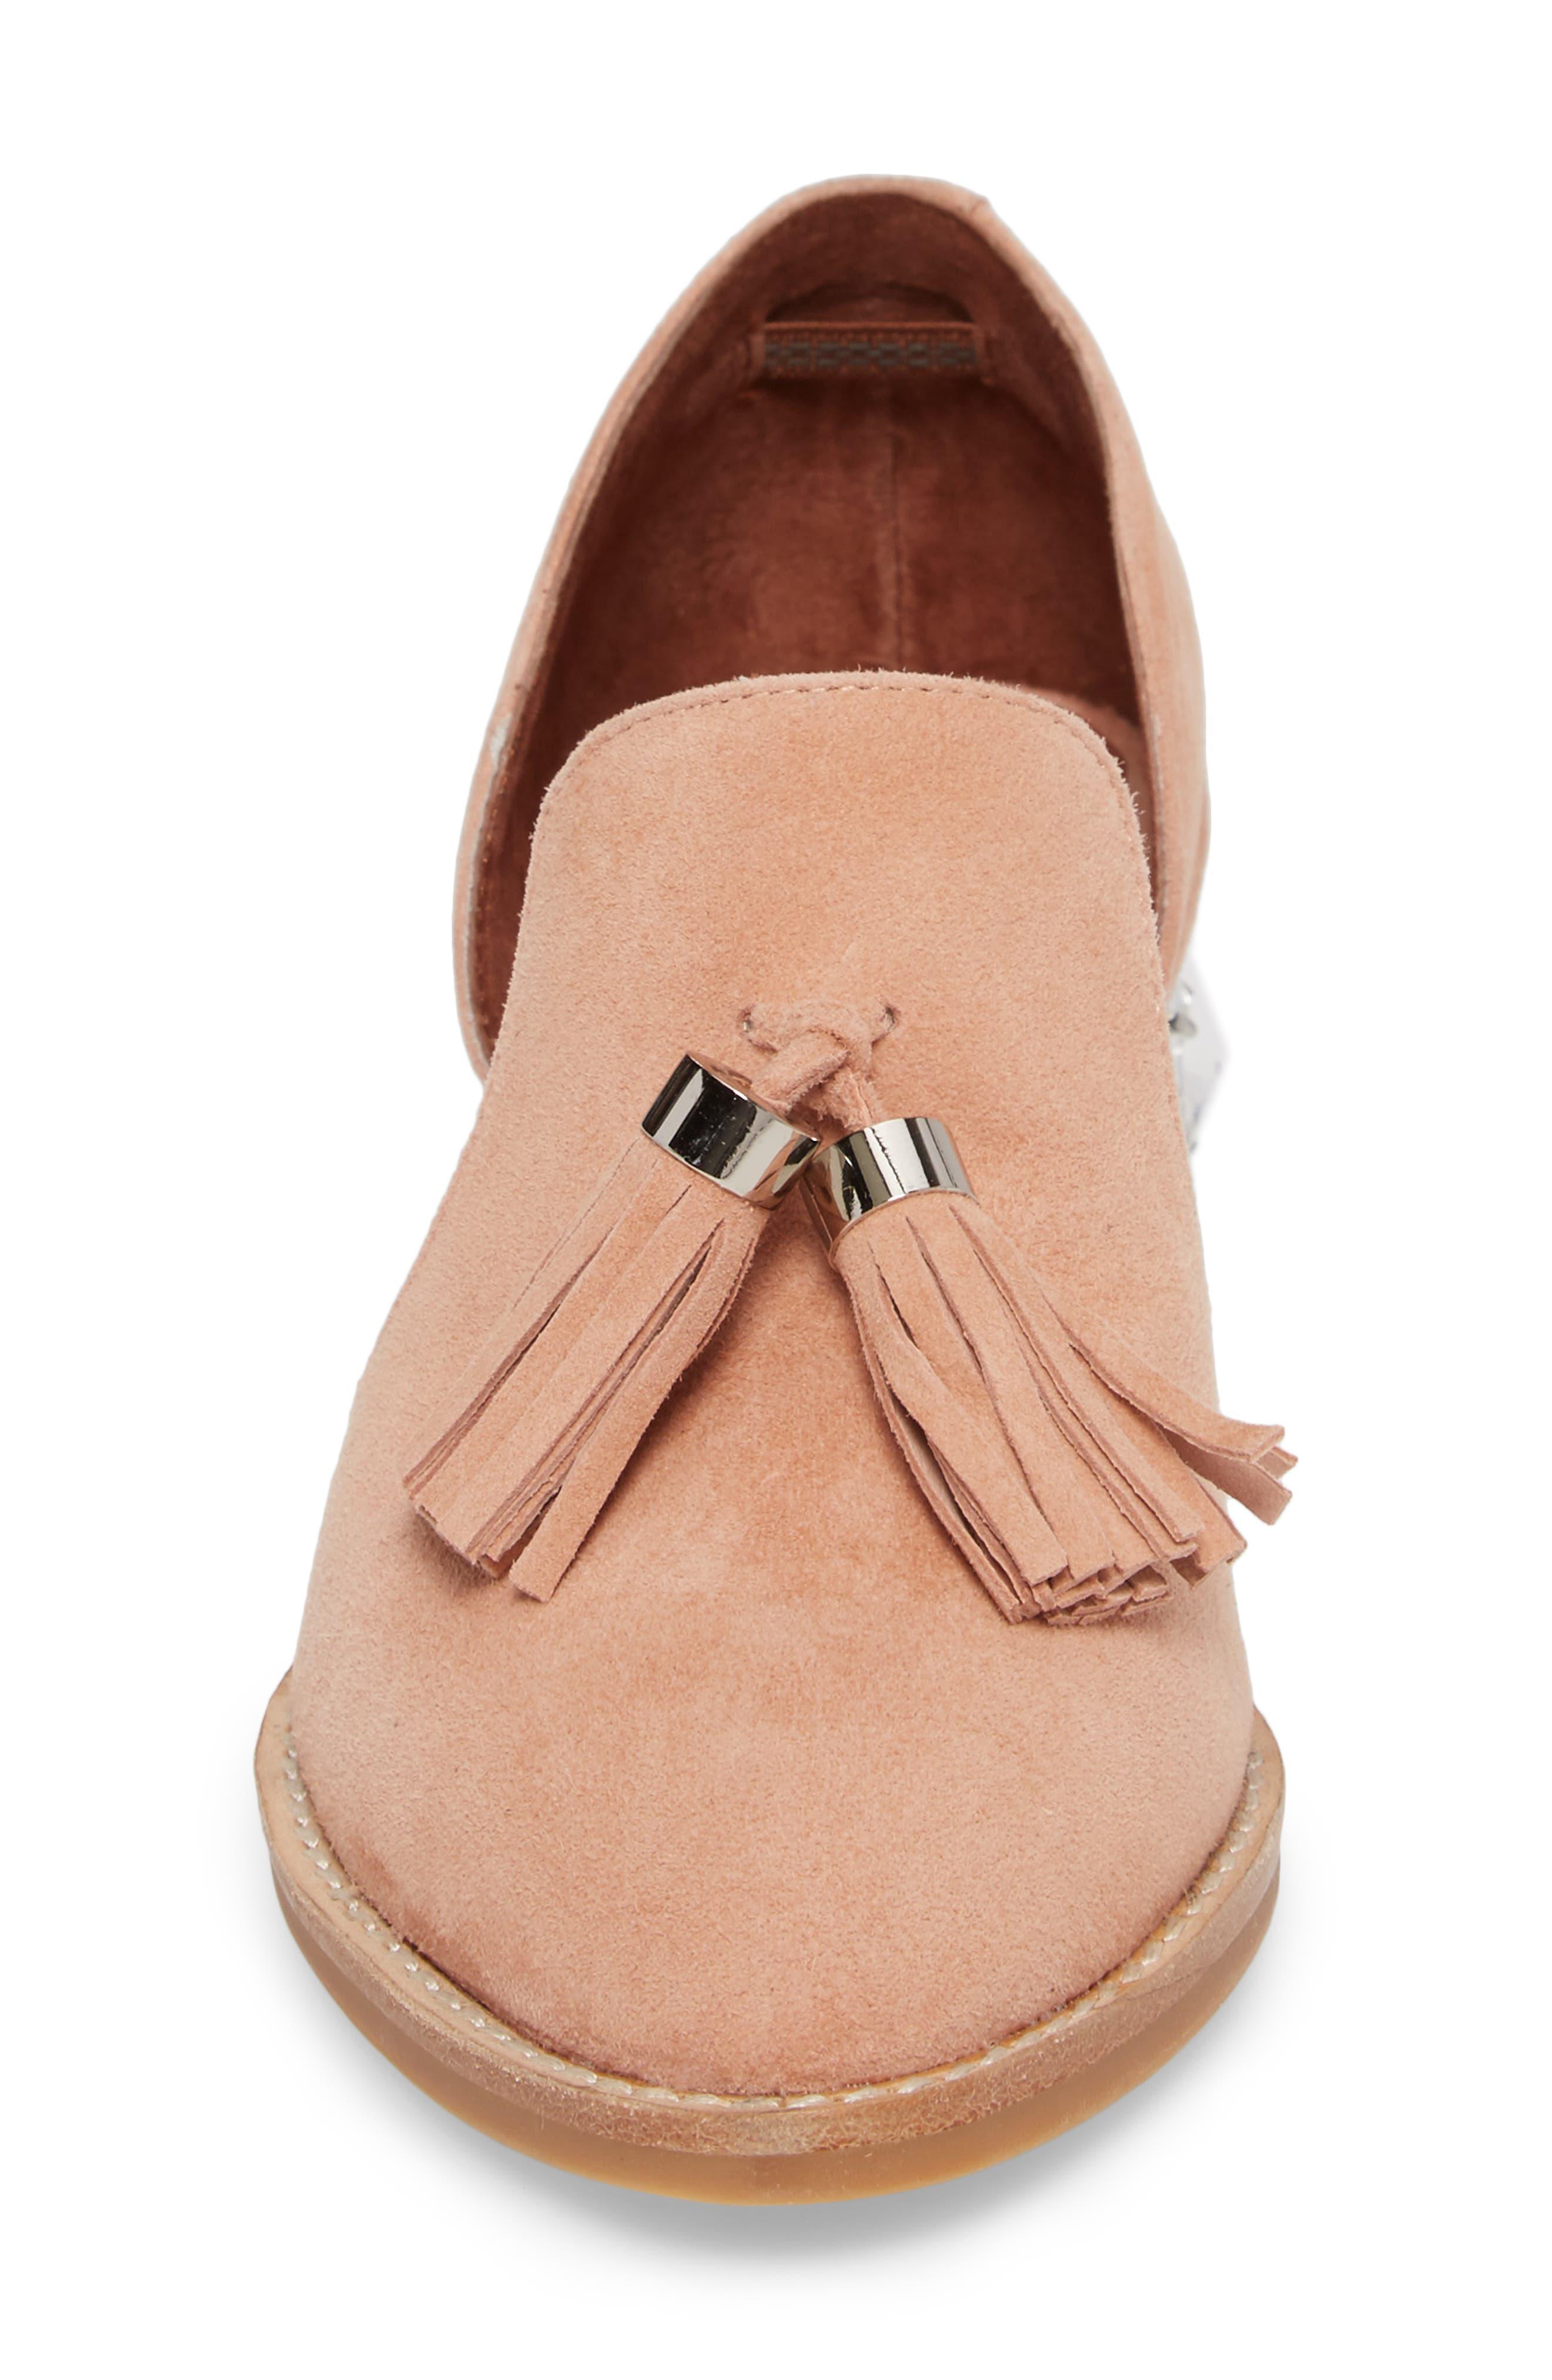 Civil Studded Loafer,                             Alternate thumbnail 4, color,                             Blush/ Silver Suede